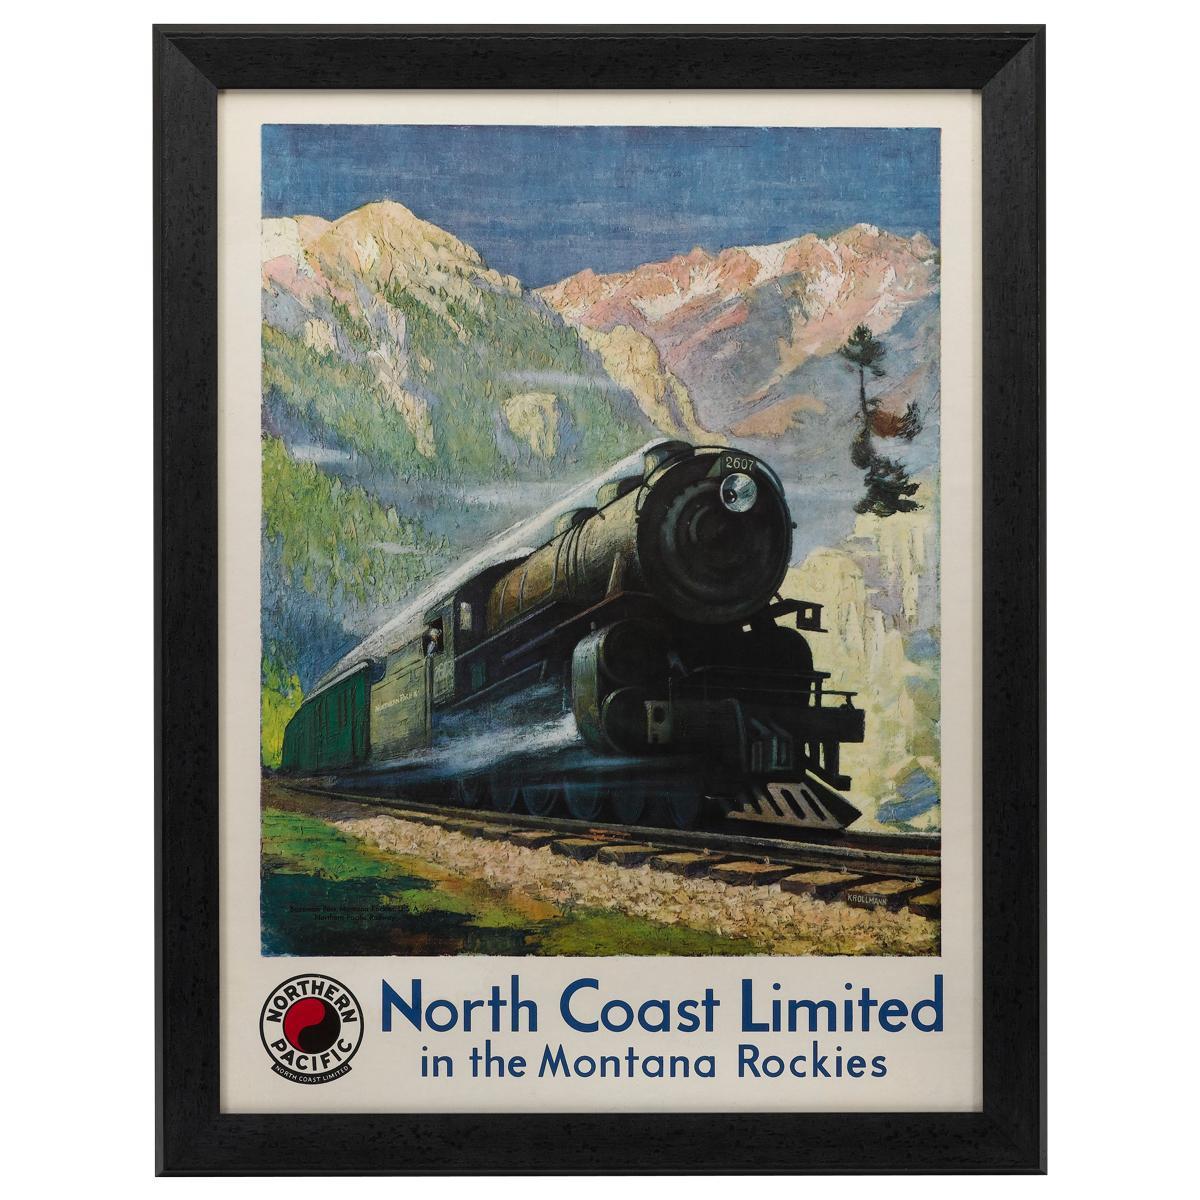 Northern Pacific Railroad Vintage Poster by Gustav W. Krollman, 1929